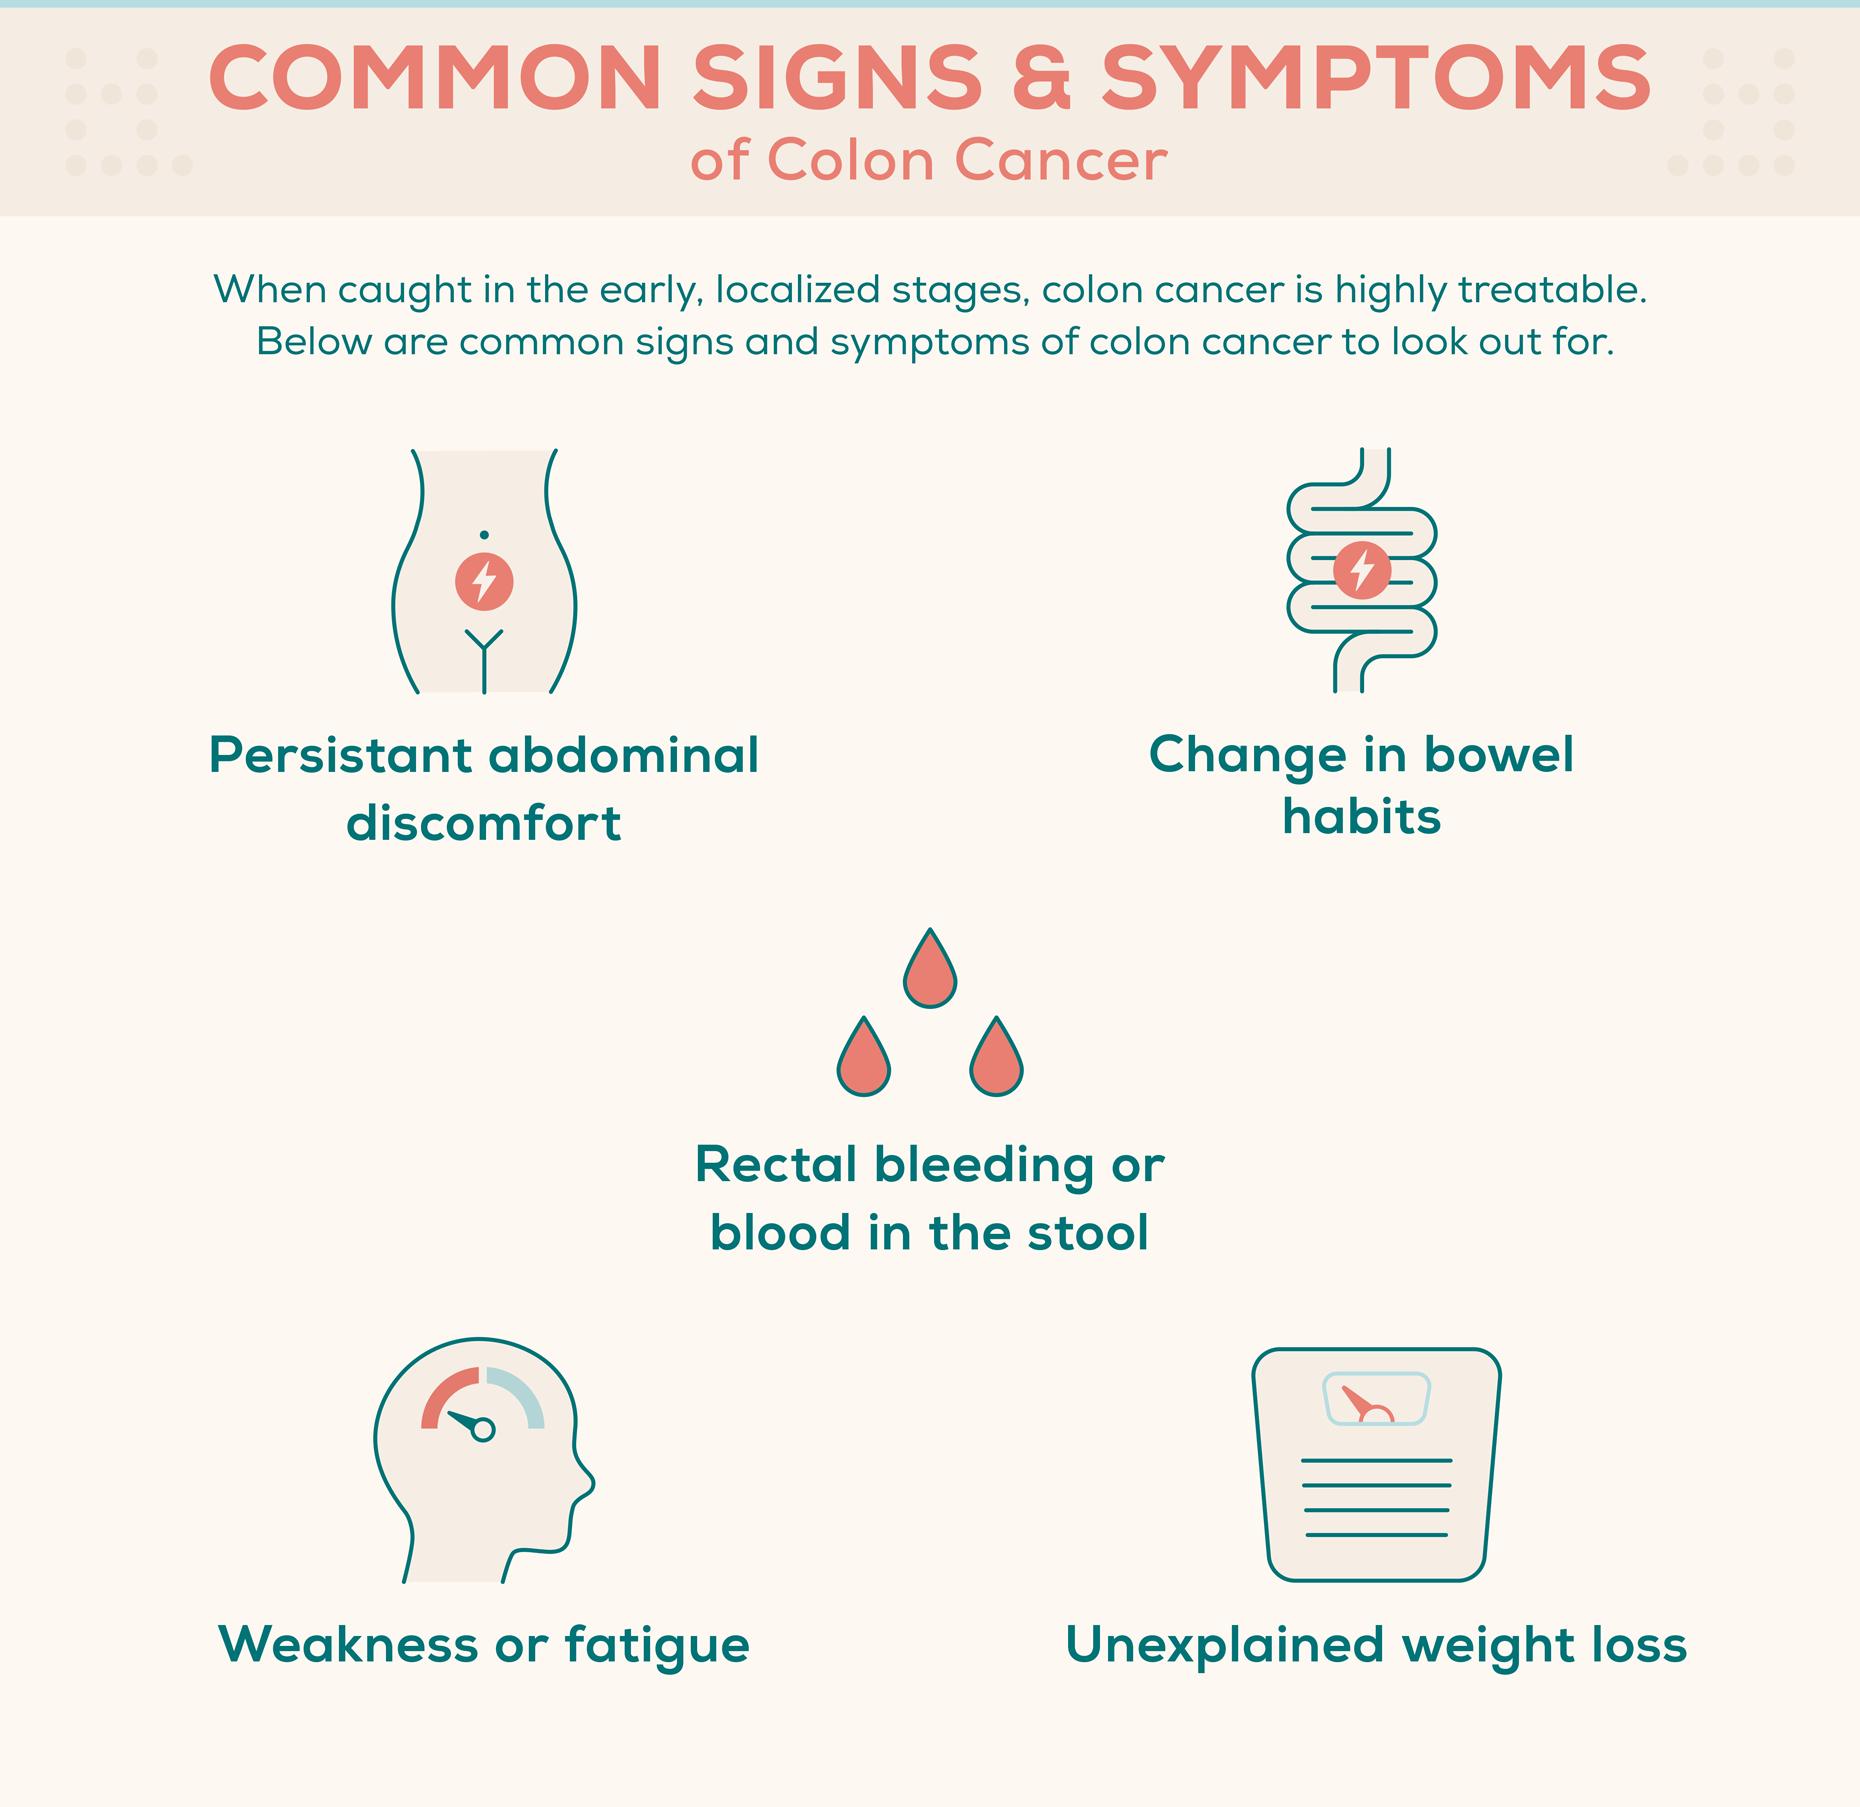 Common Signs & Symptoms of Colon Cancer